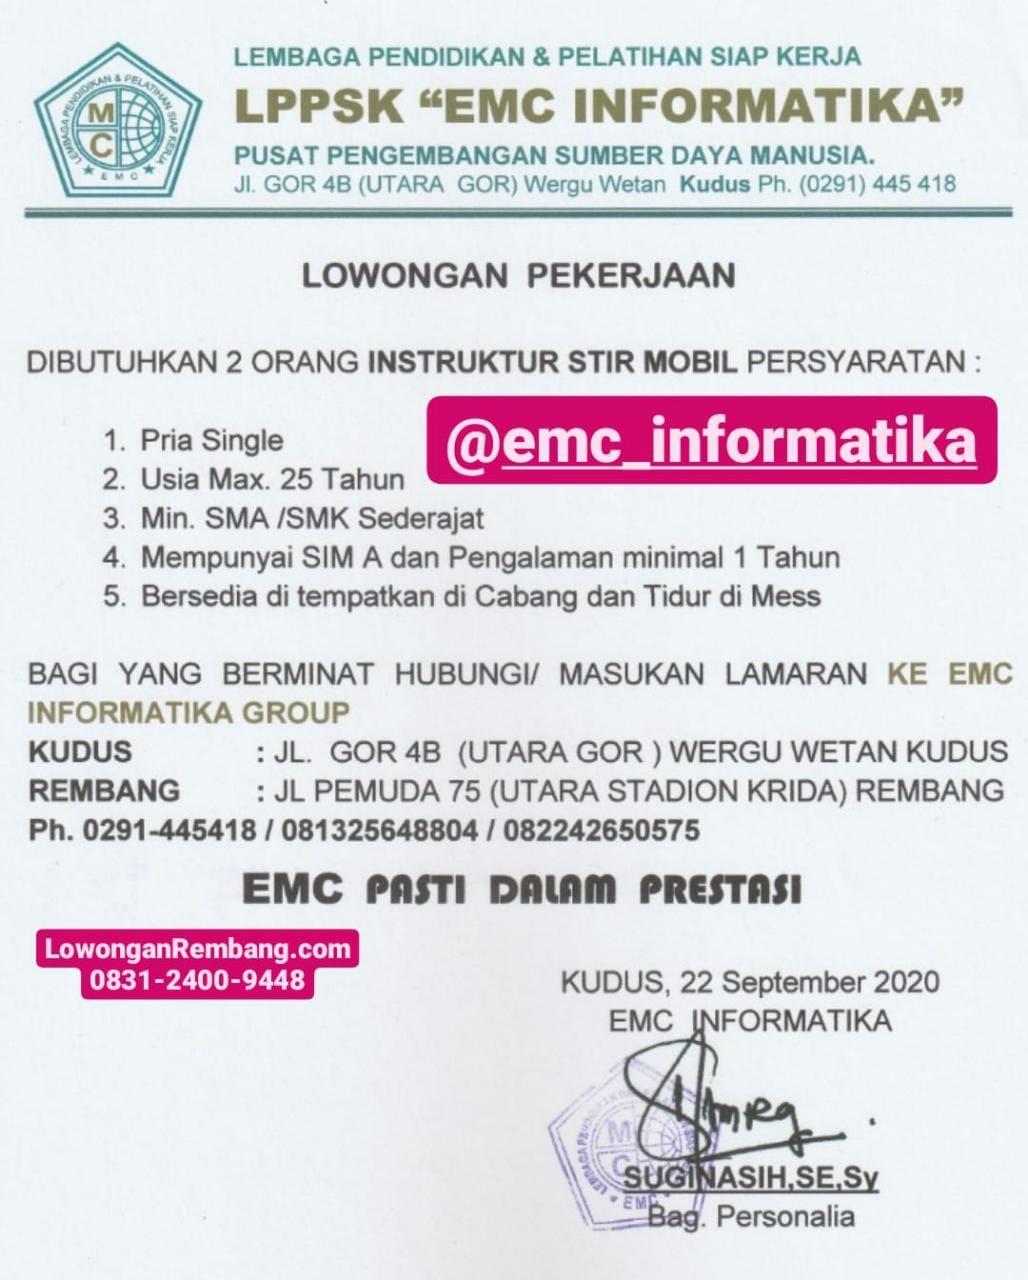 Segera Lamar Lowongan Kerja Instruktur Stir Mobil EMC Informatika Rembang